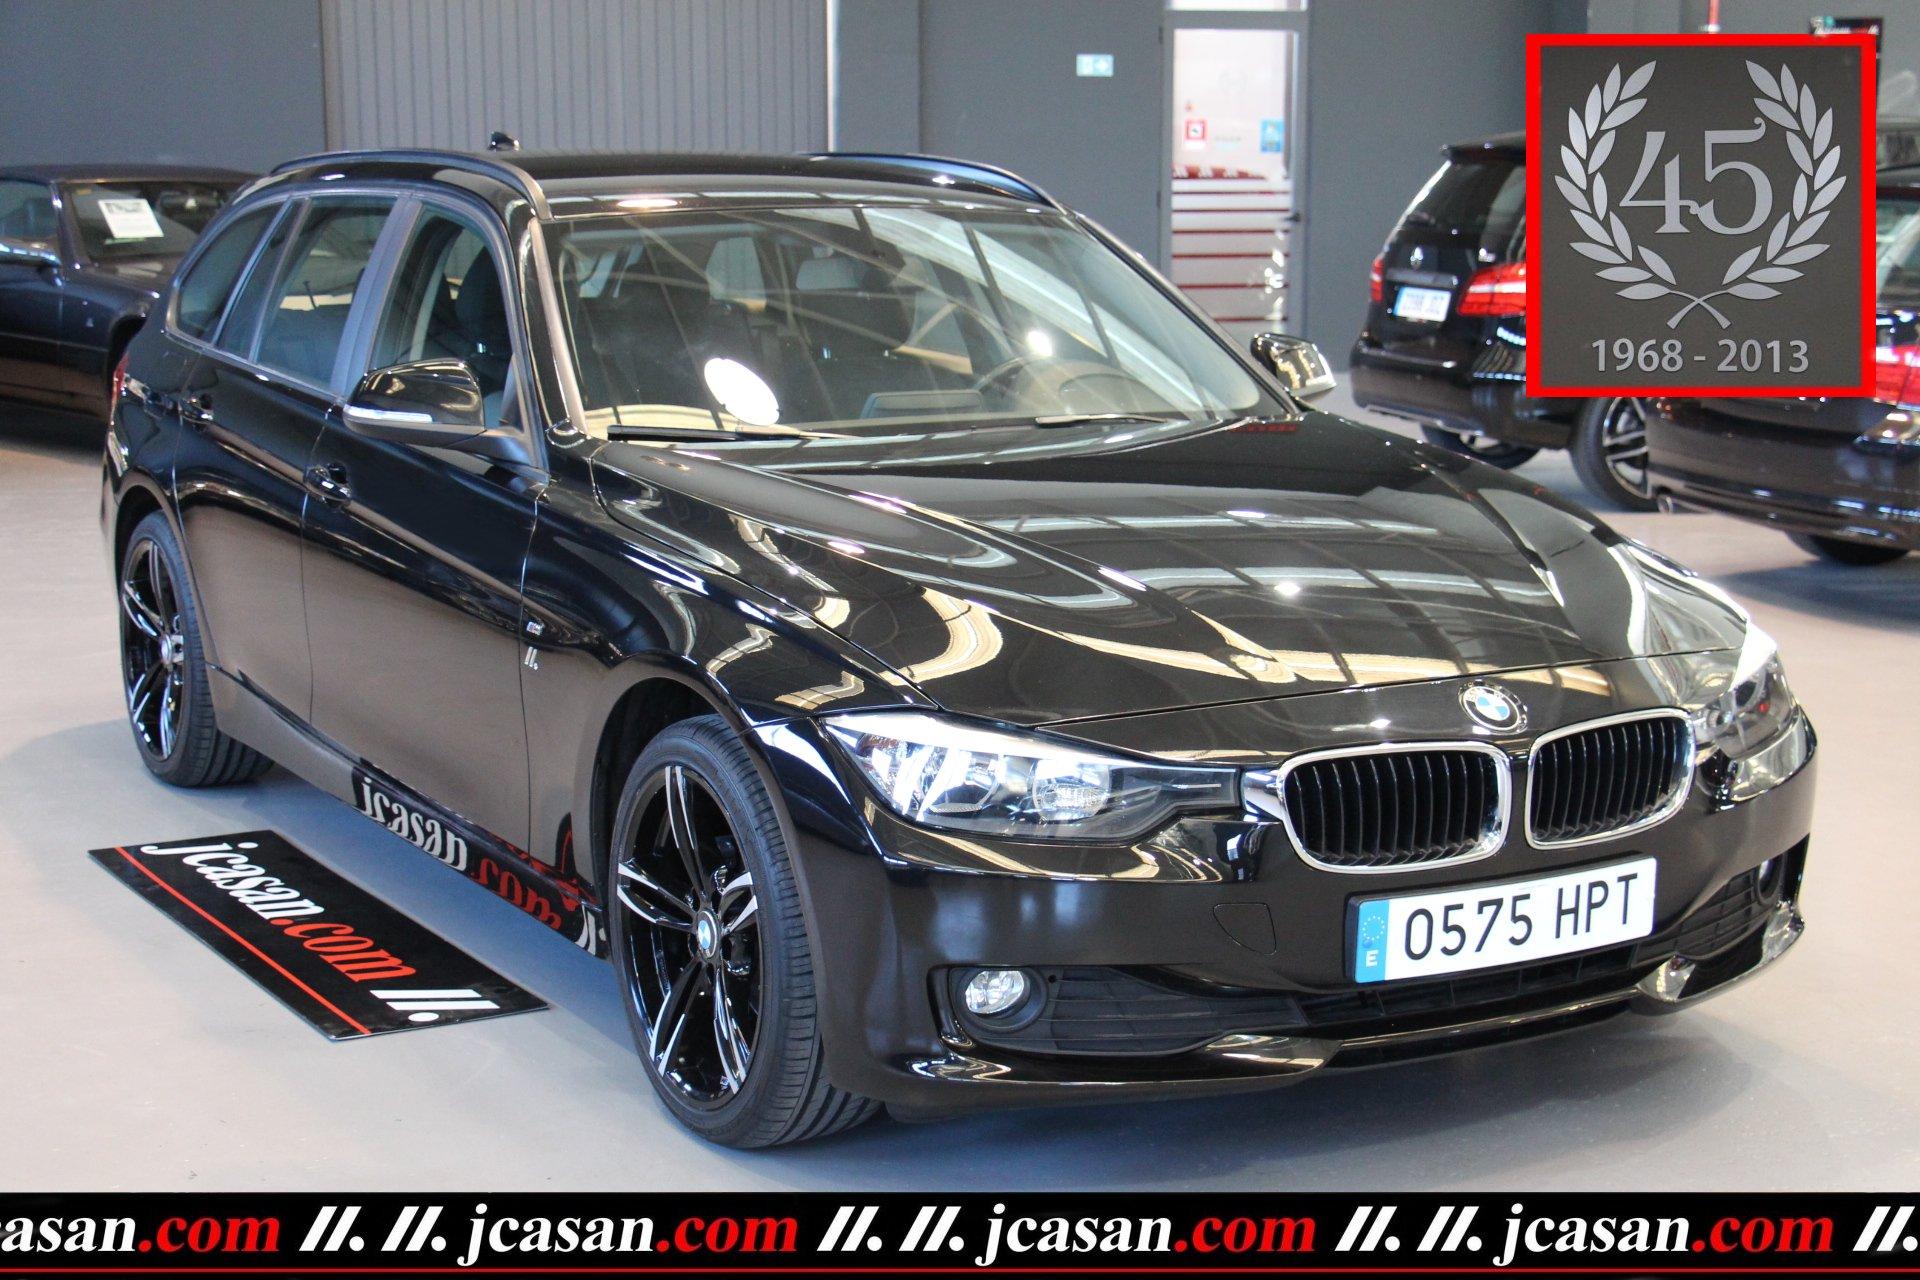 BMW 318d TOURING 143 CV 6 Vel